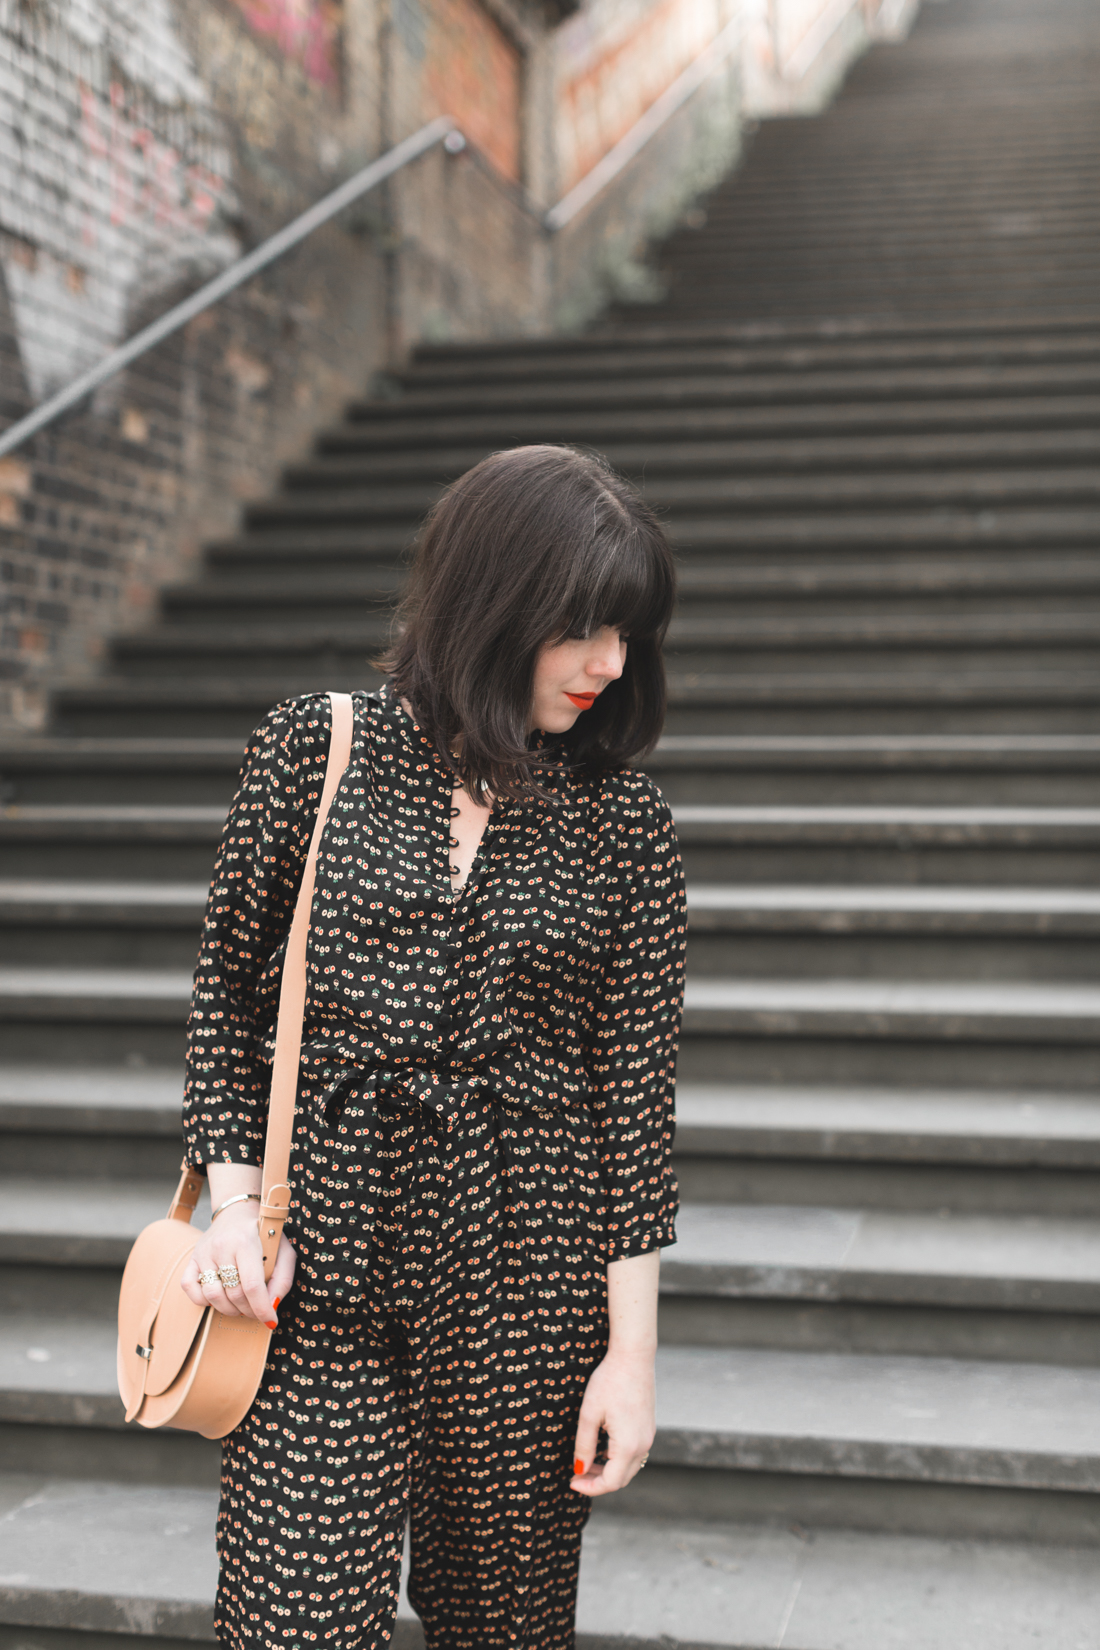 combi_sezane_sac_claude_ballerines-chaussures-exclusif-paris_Pauline_Privez_paulinefashionblog_com-9